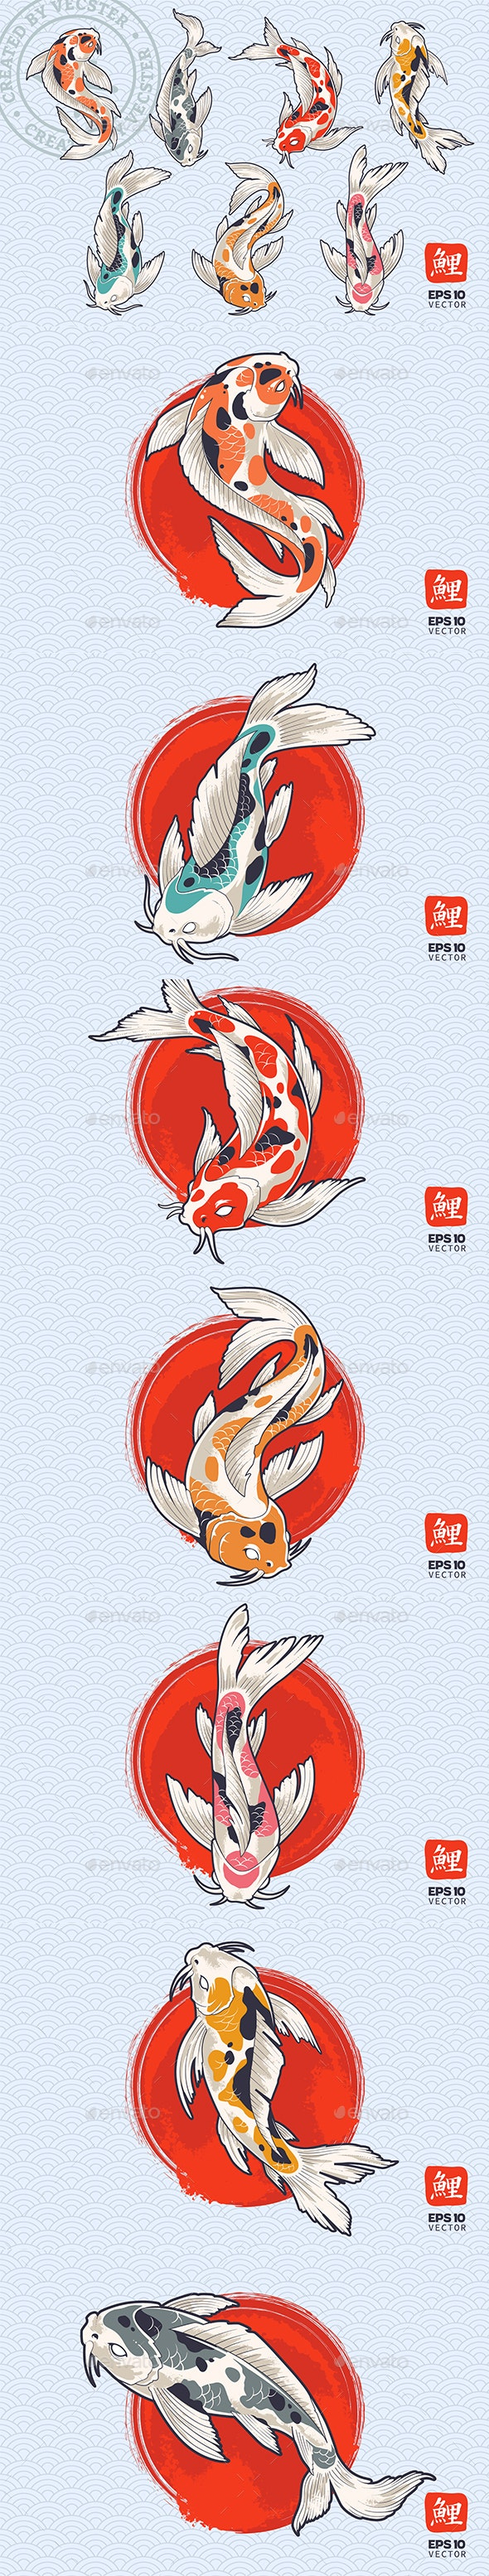 Koi Fish Vector Set - Animals Characters